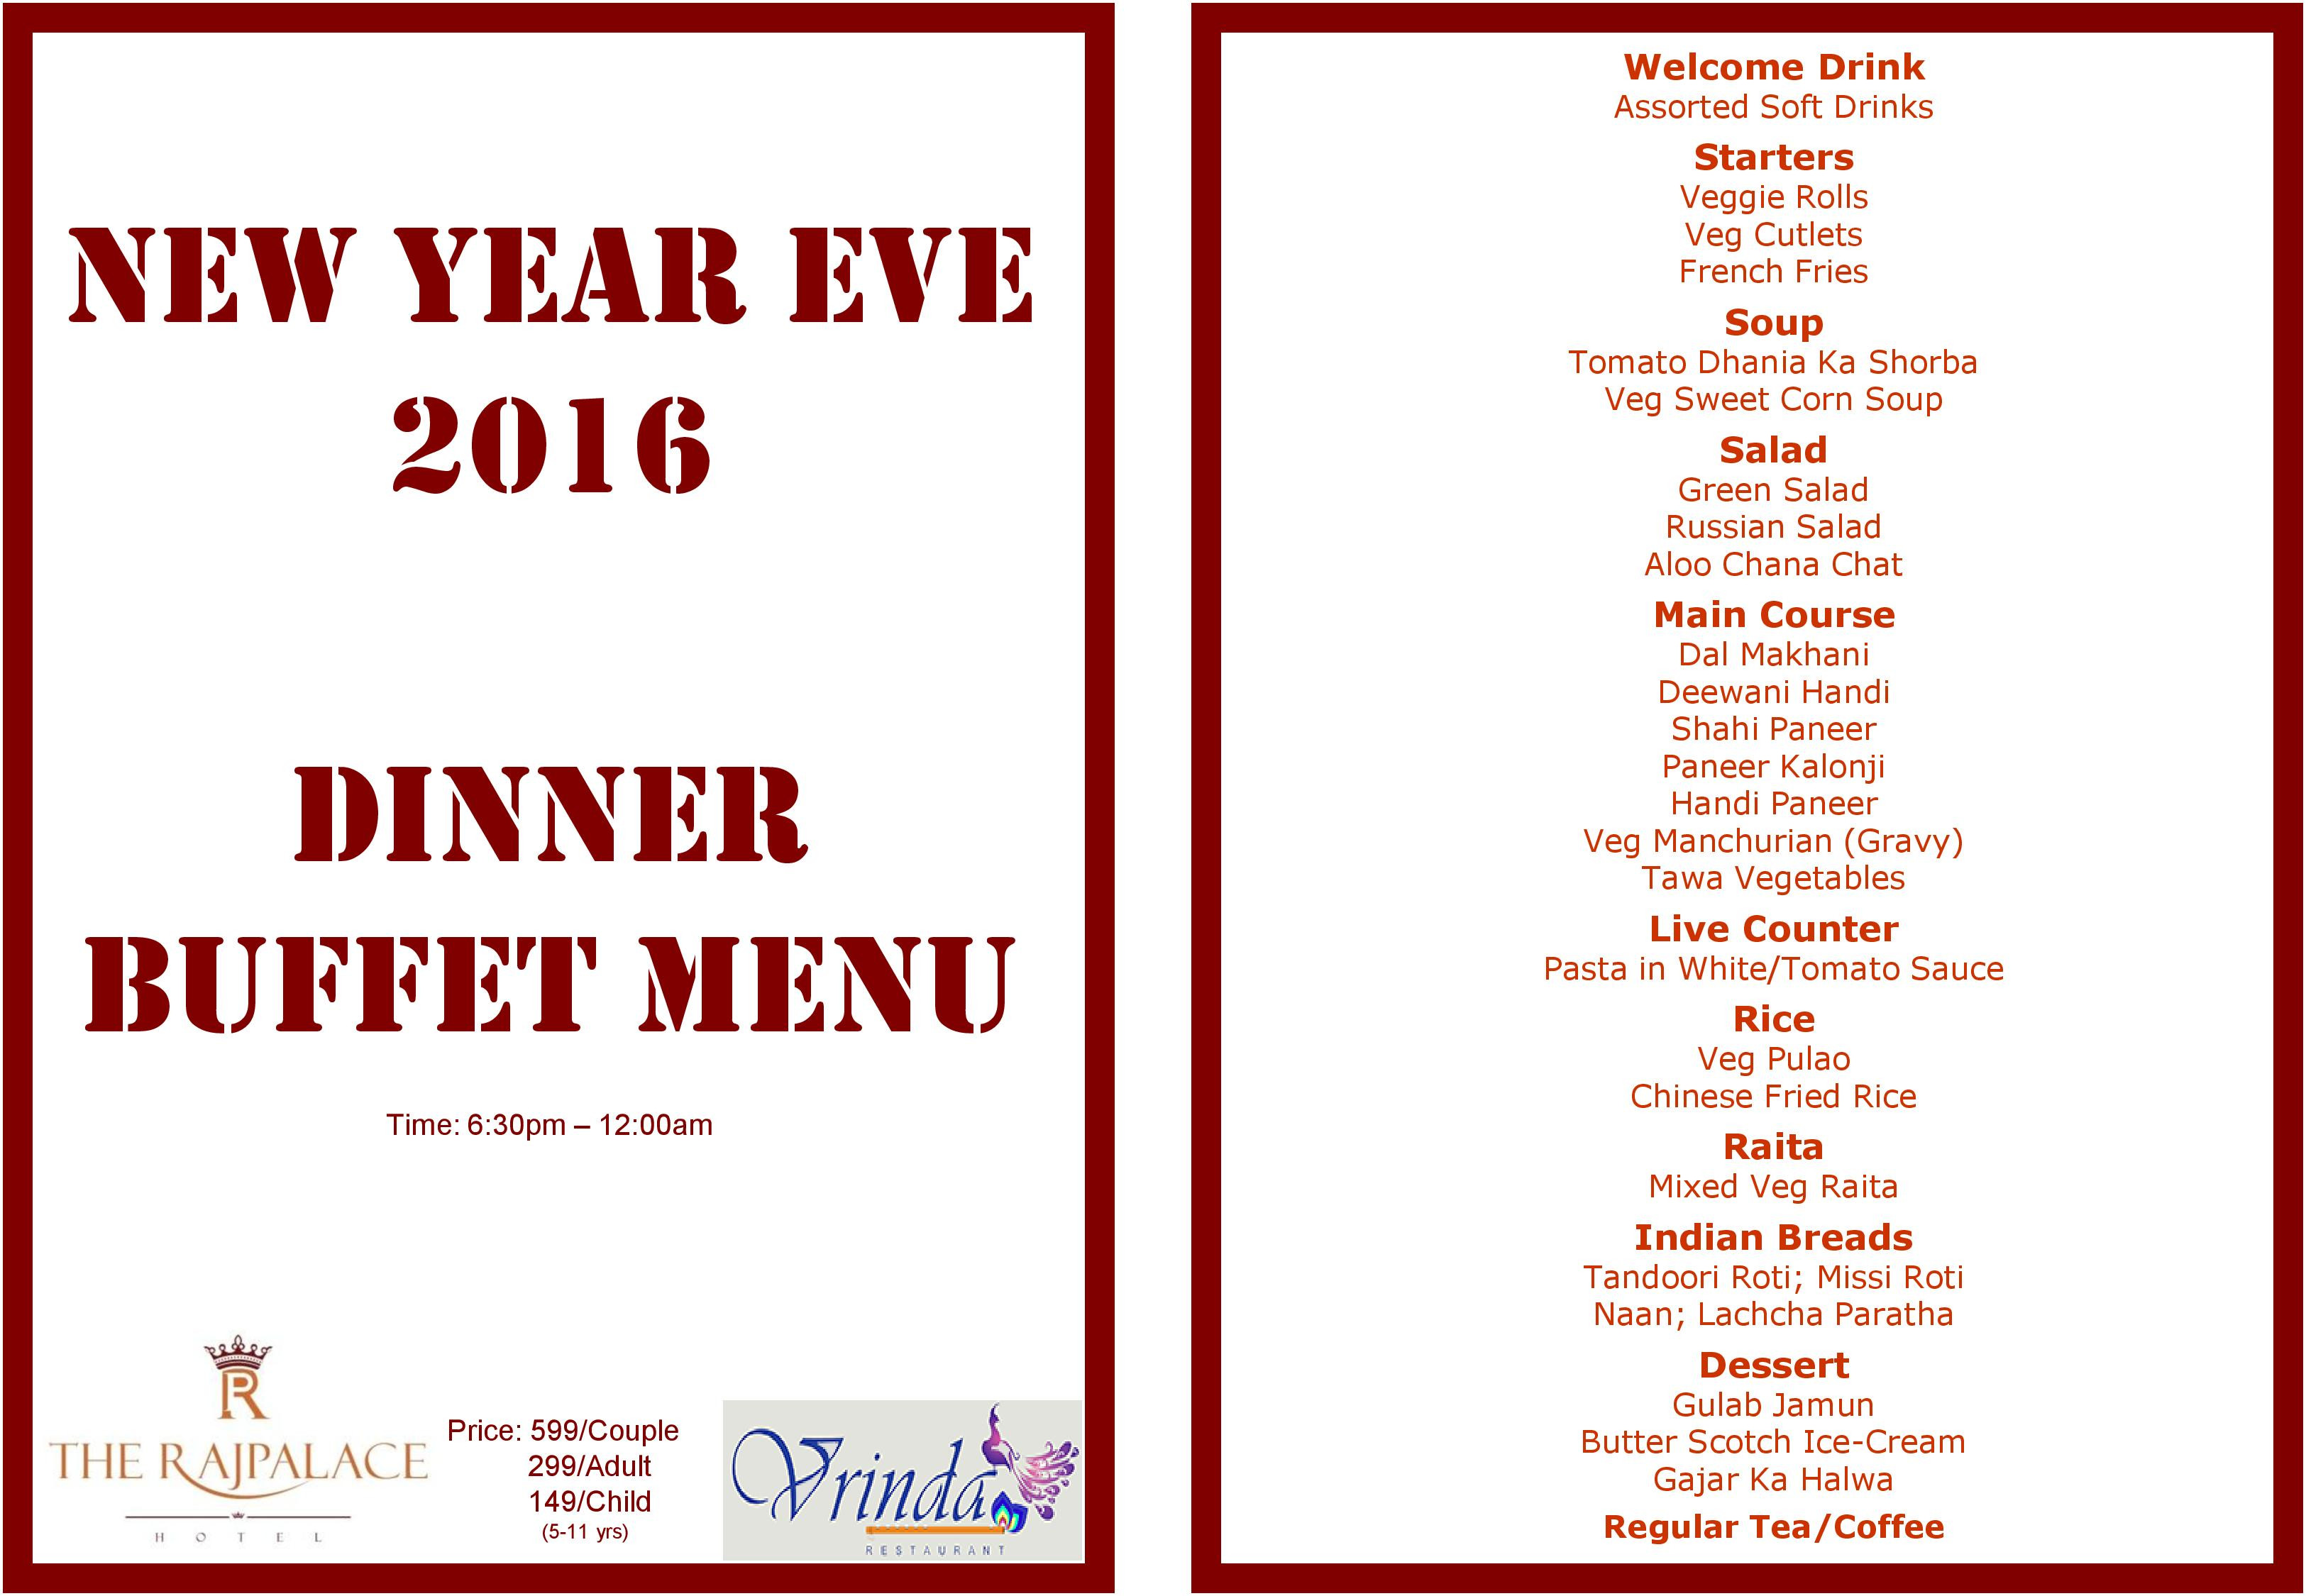 New Year Day Dinner Menu  NEW YEAR EVE 2016 DINNER BUFFET MENU – Our fer